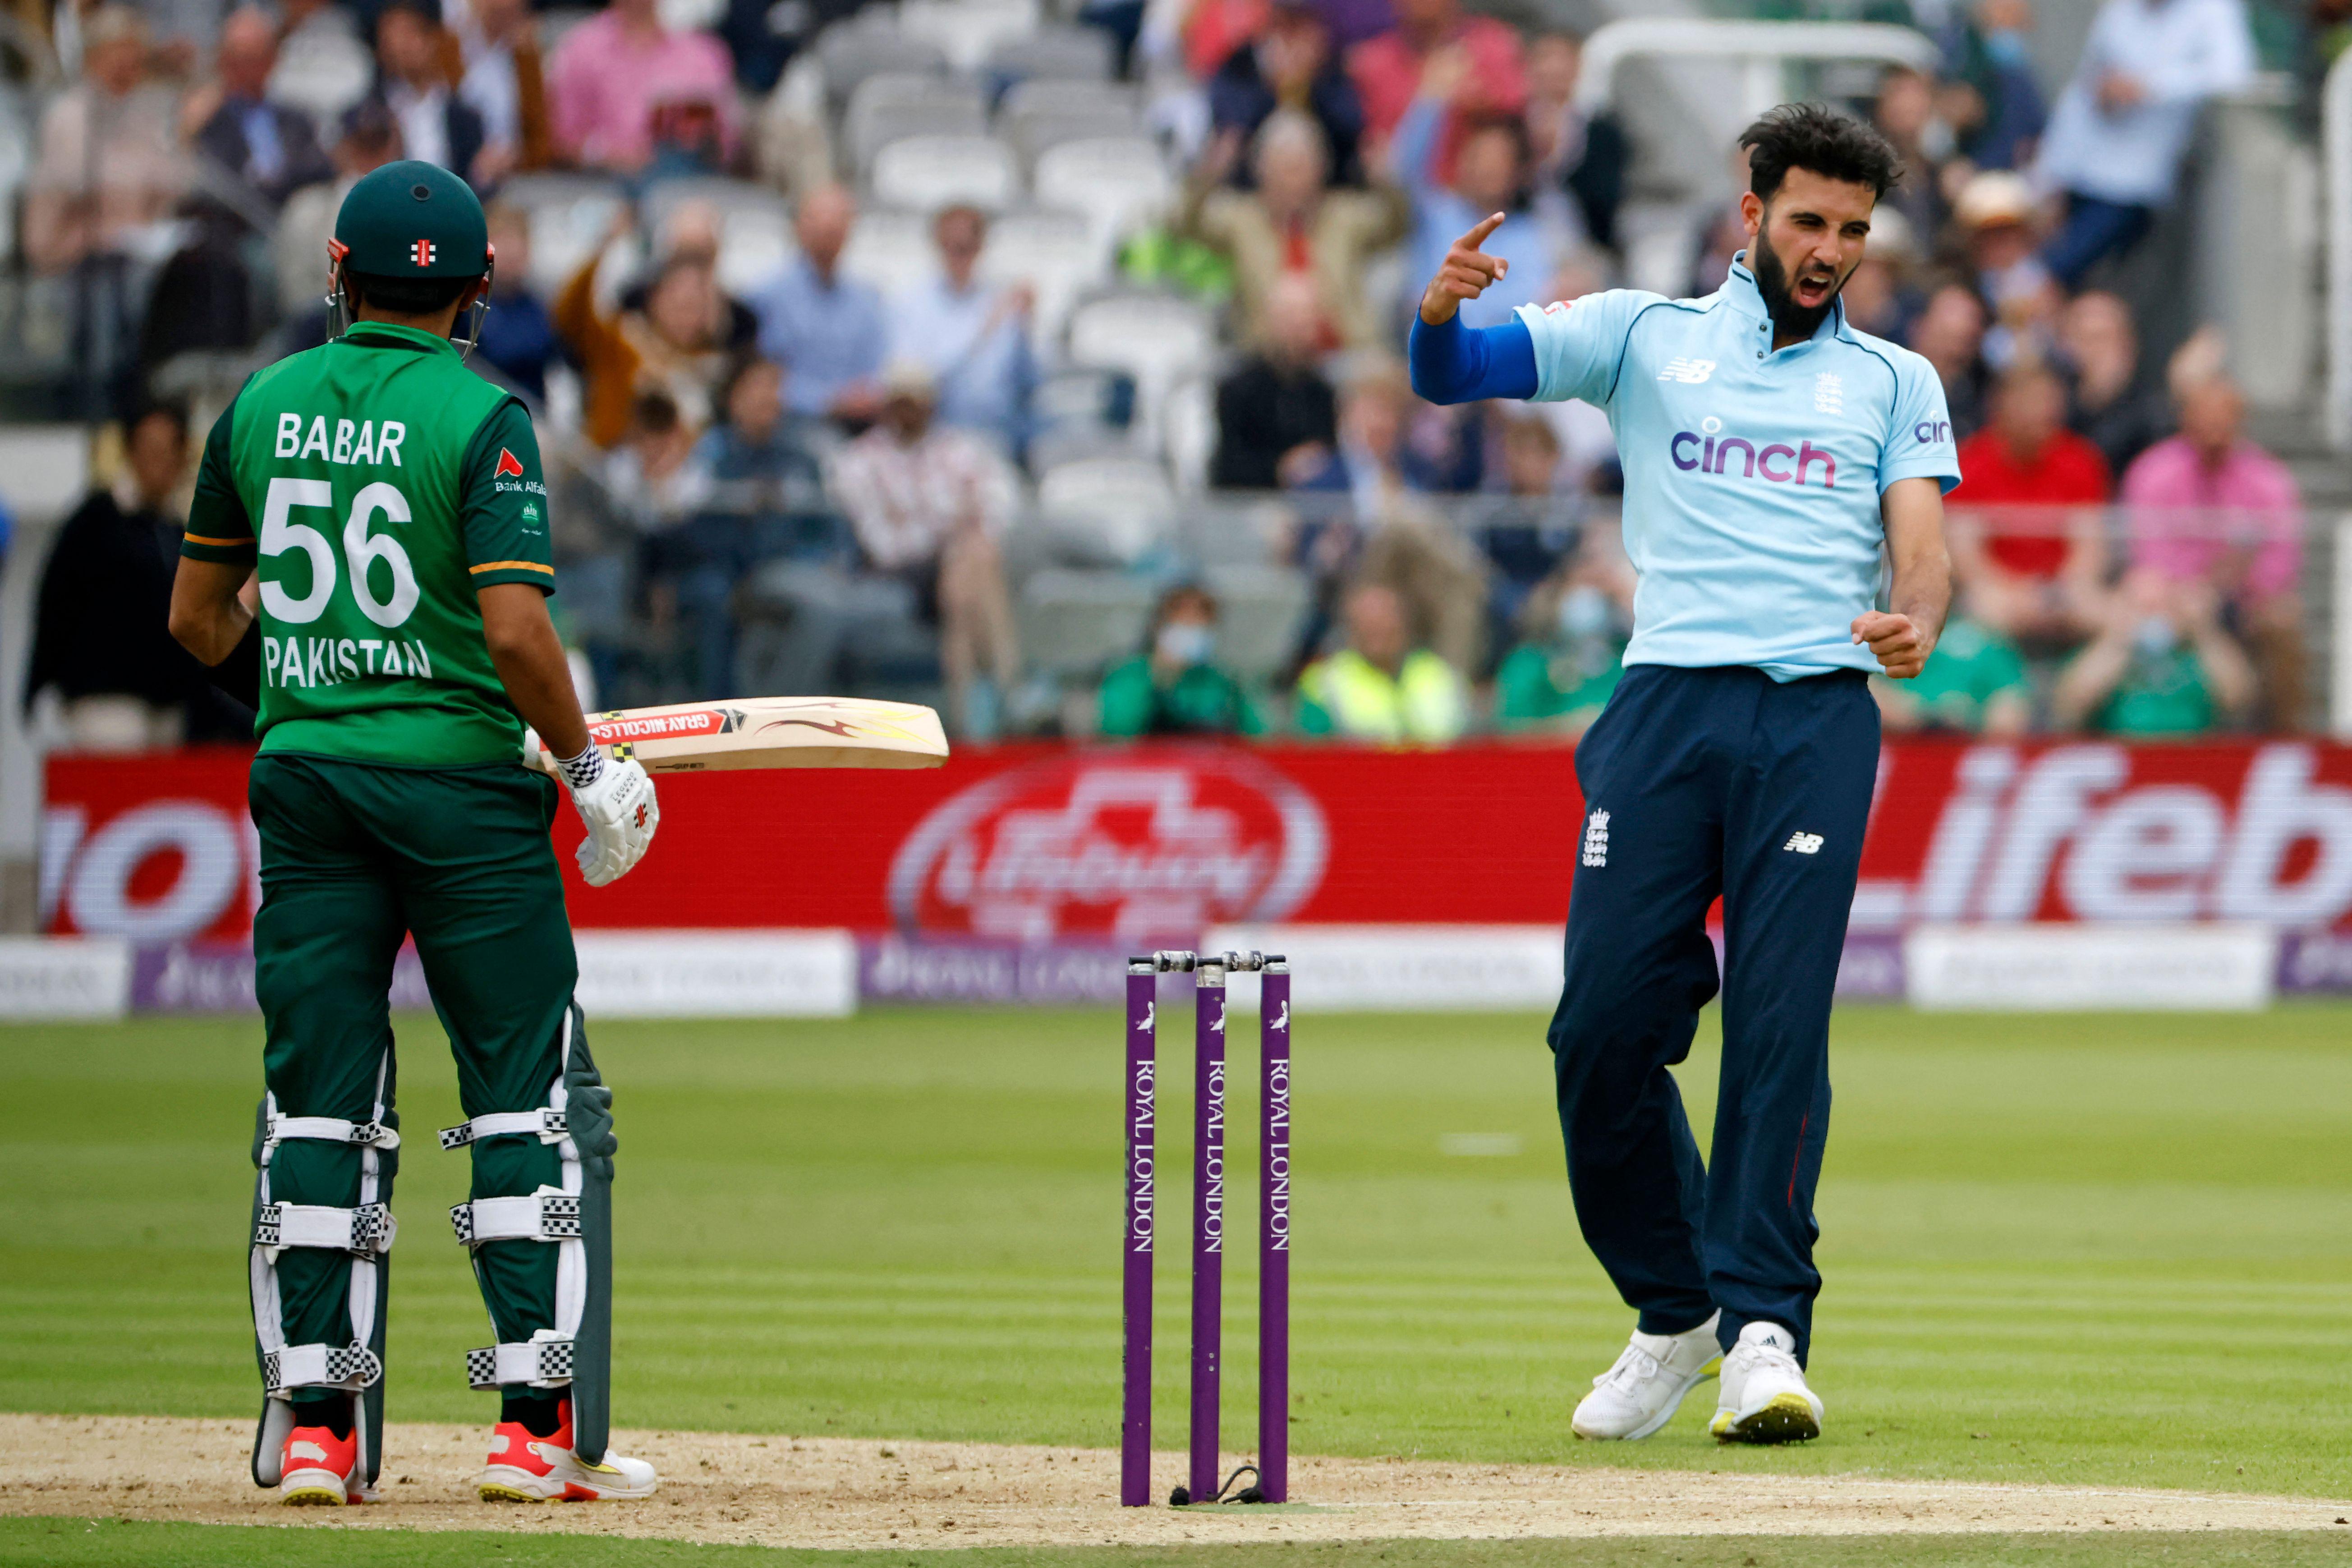 Mahmood dismissed Pakistan star Babar Azam twice in England's 3-0 series win // Getty